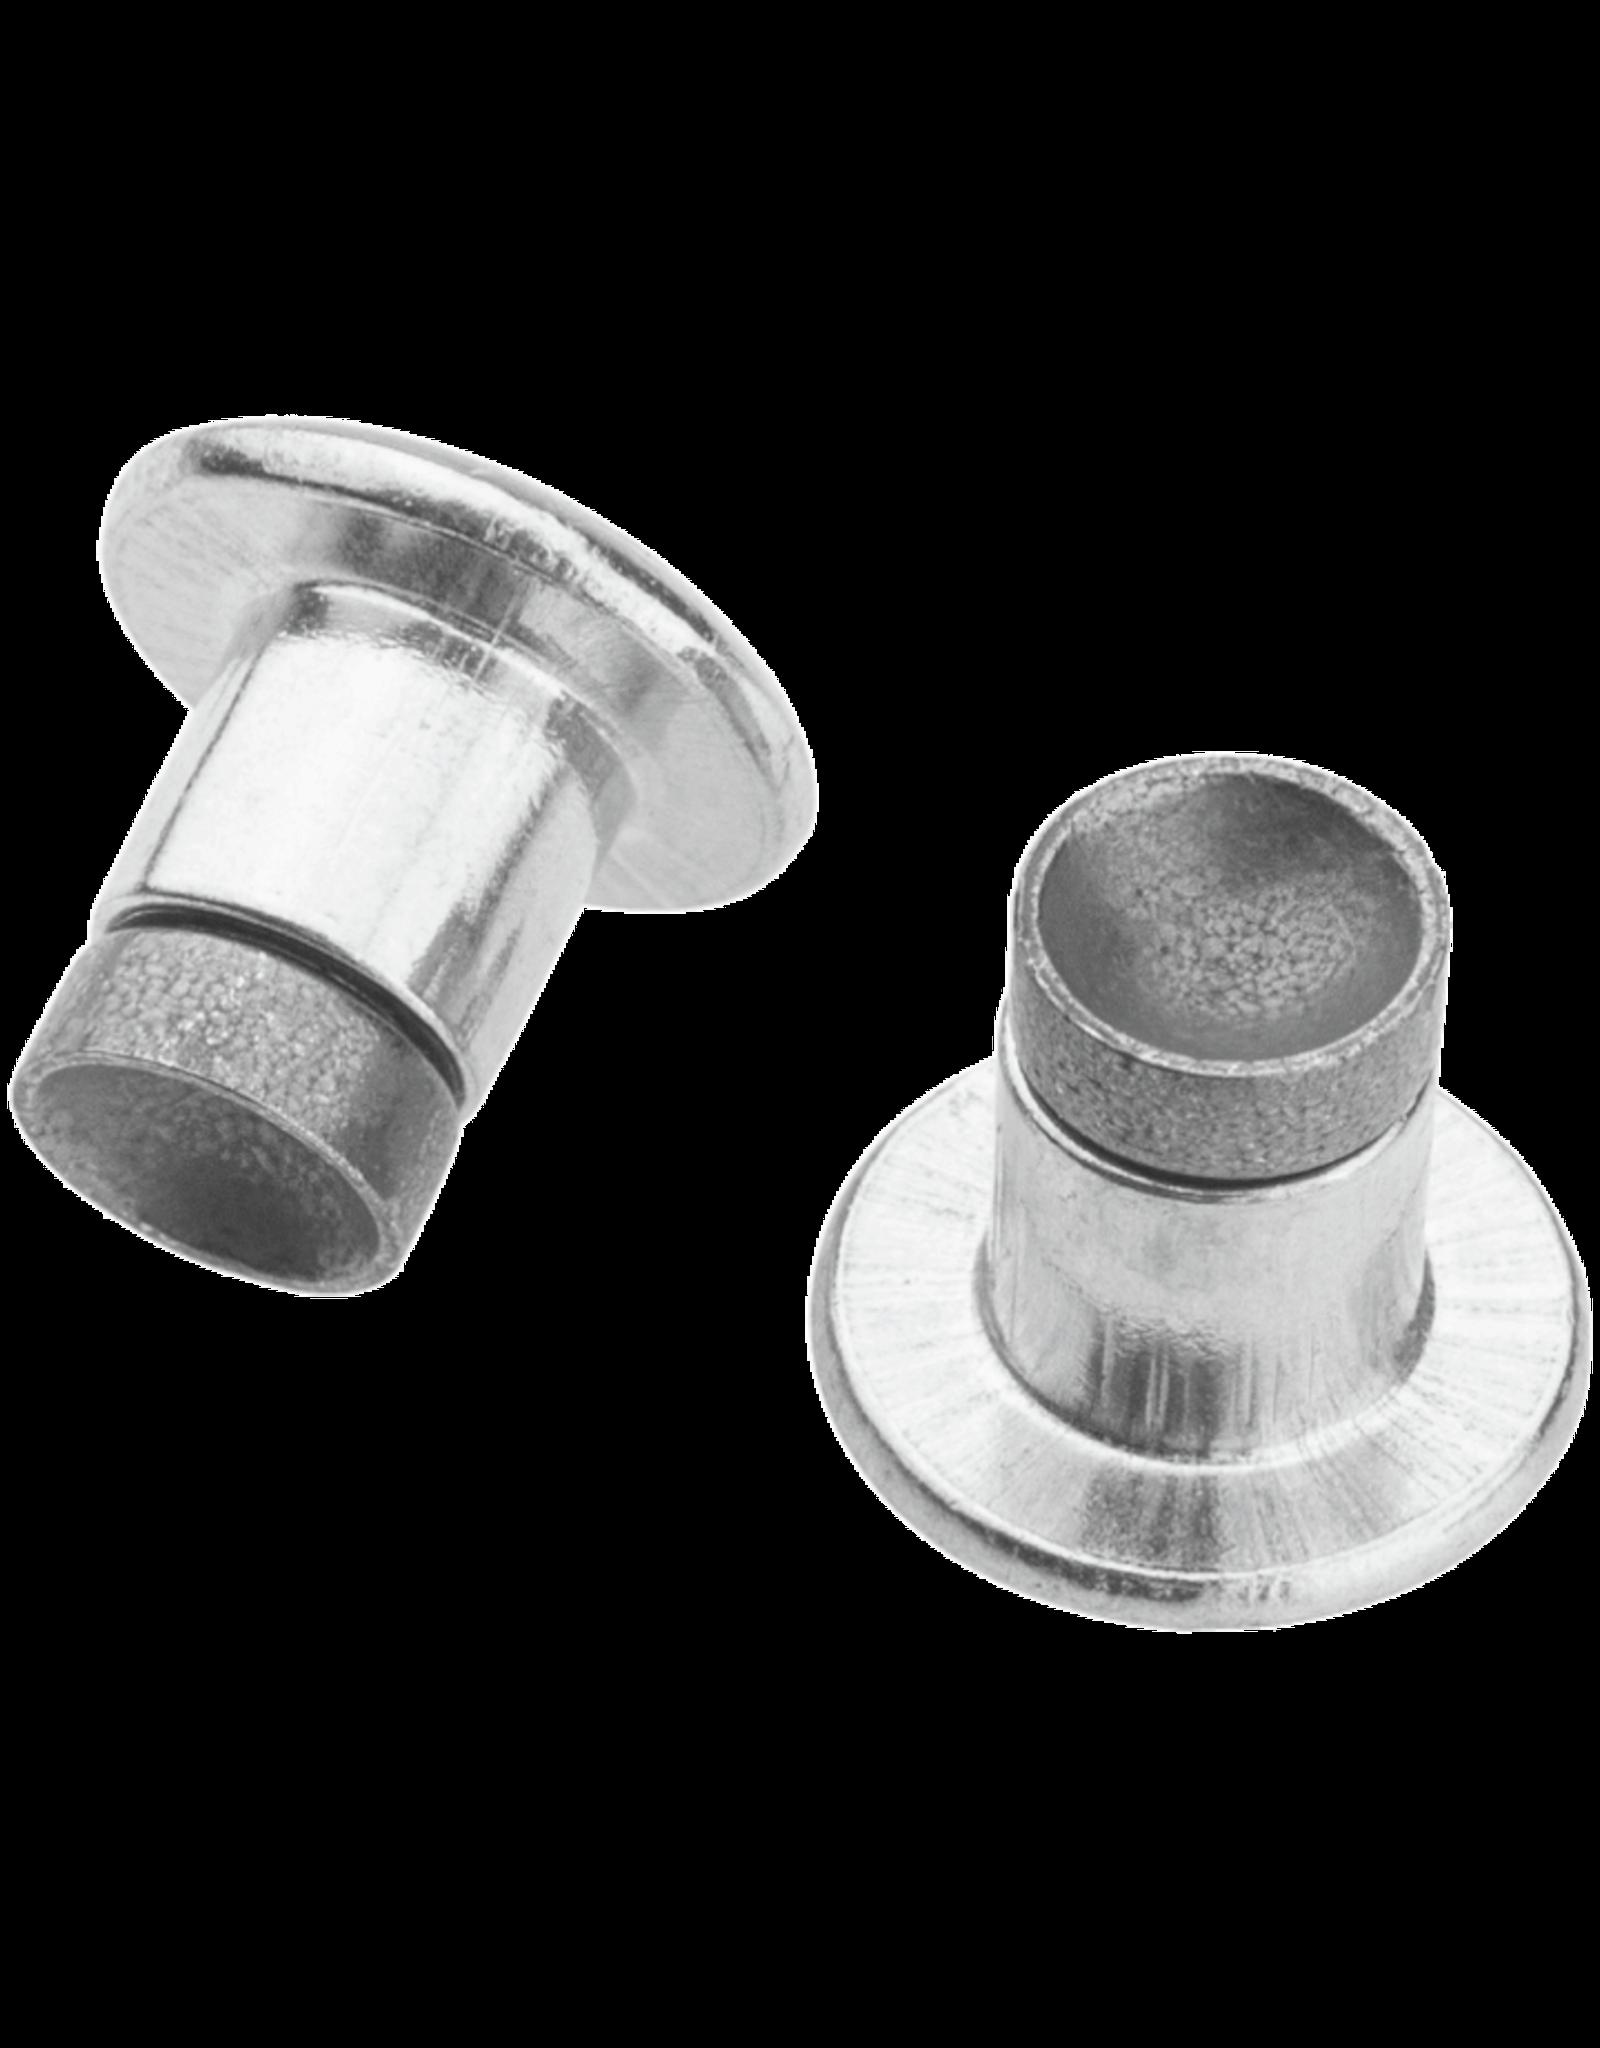 45NRTH Clous 45NRTH concaves aluminium XL